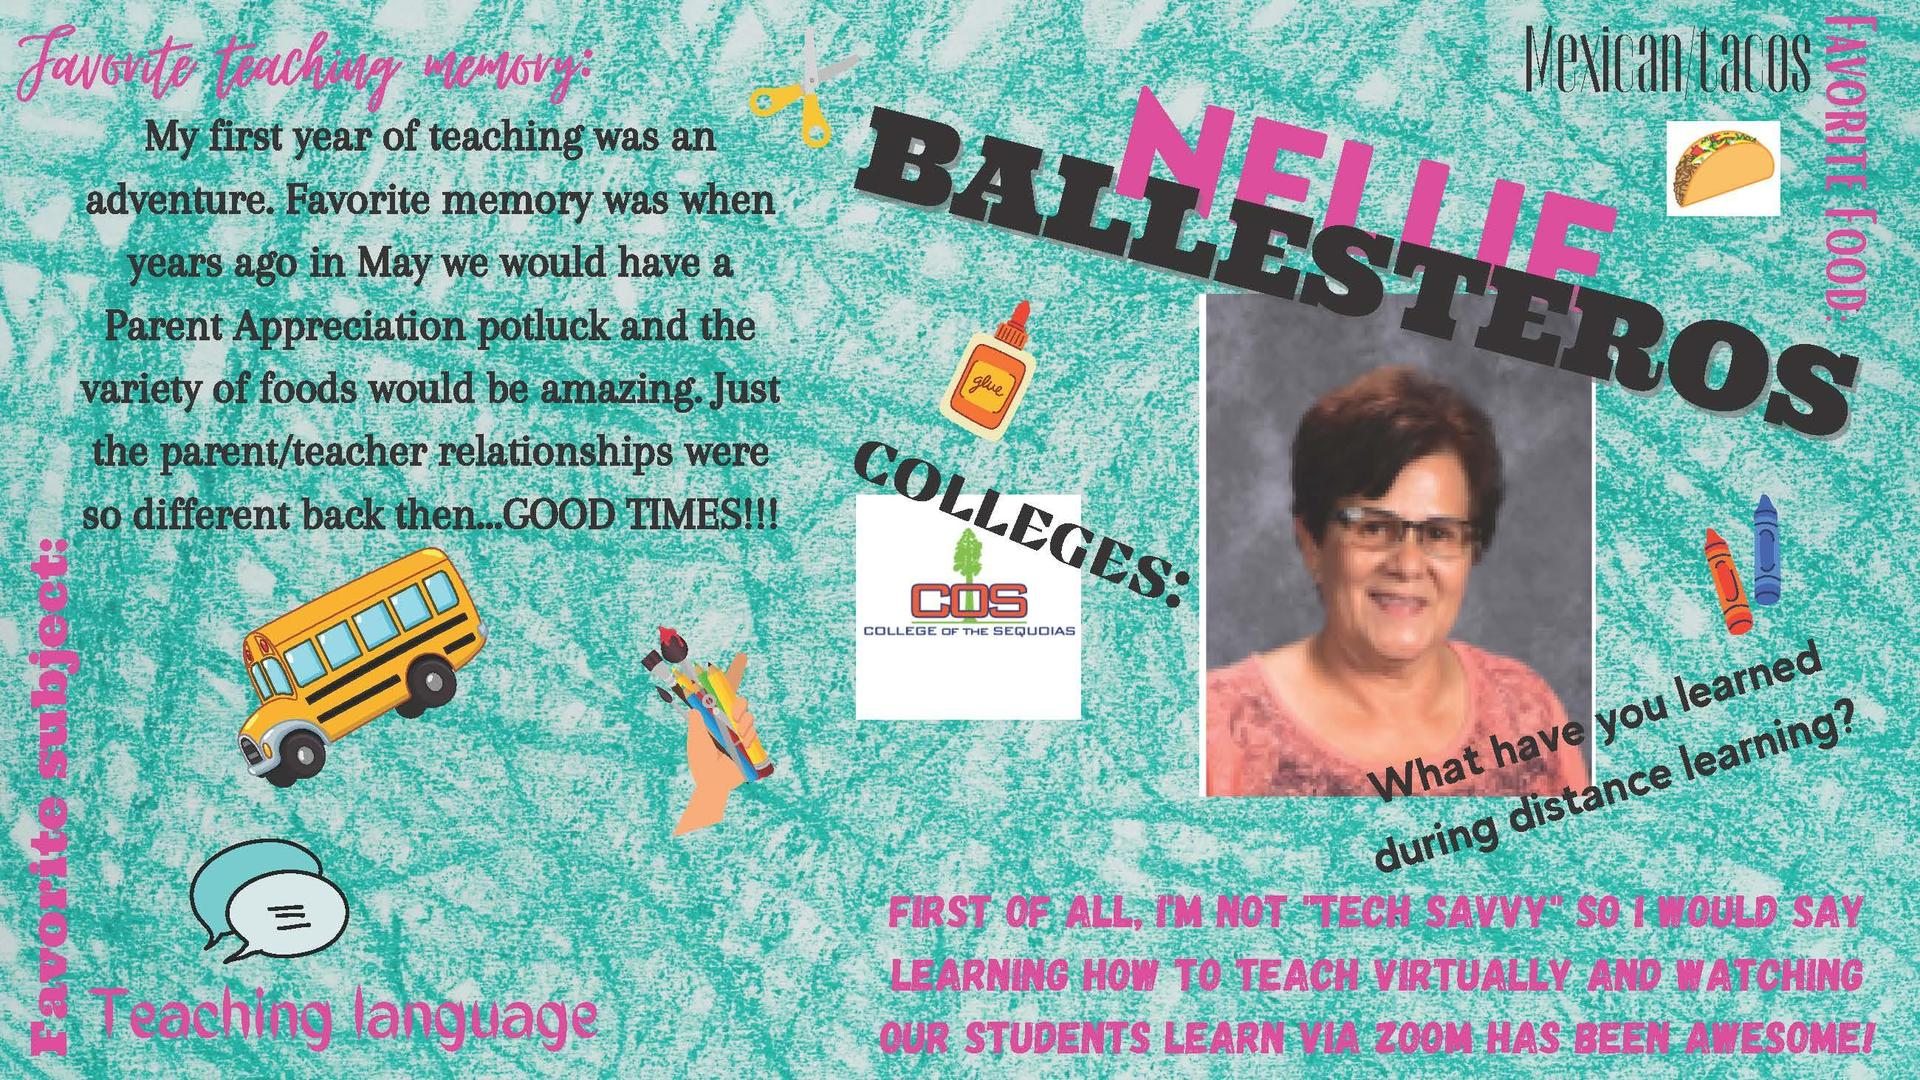 Nellie Ballesteros Staff member of the week